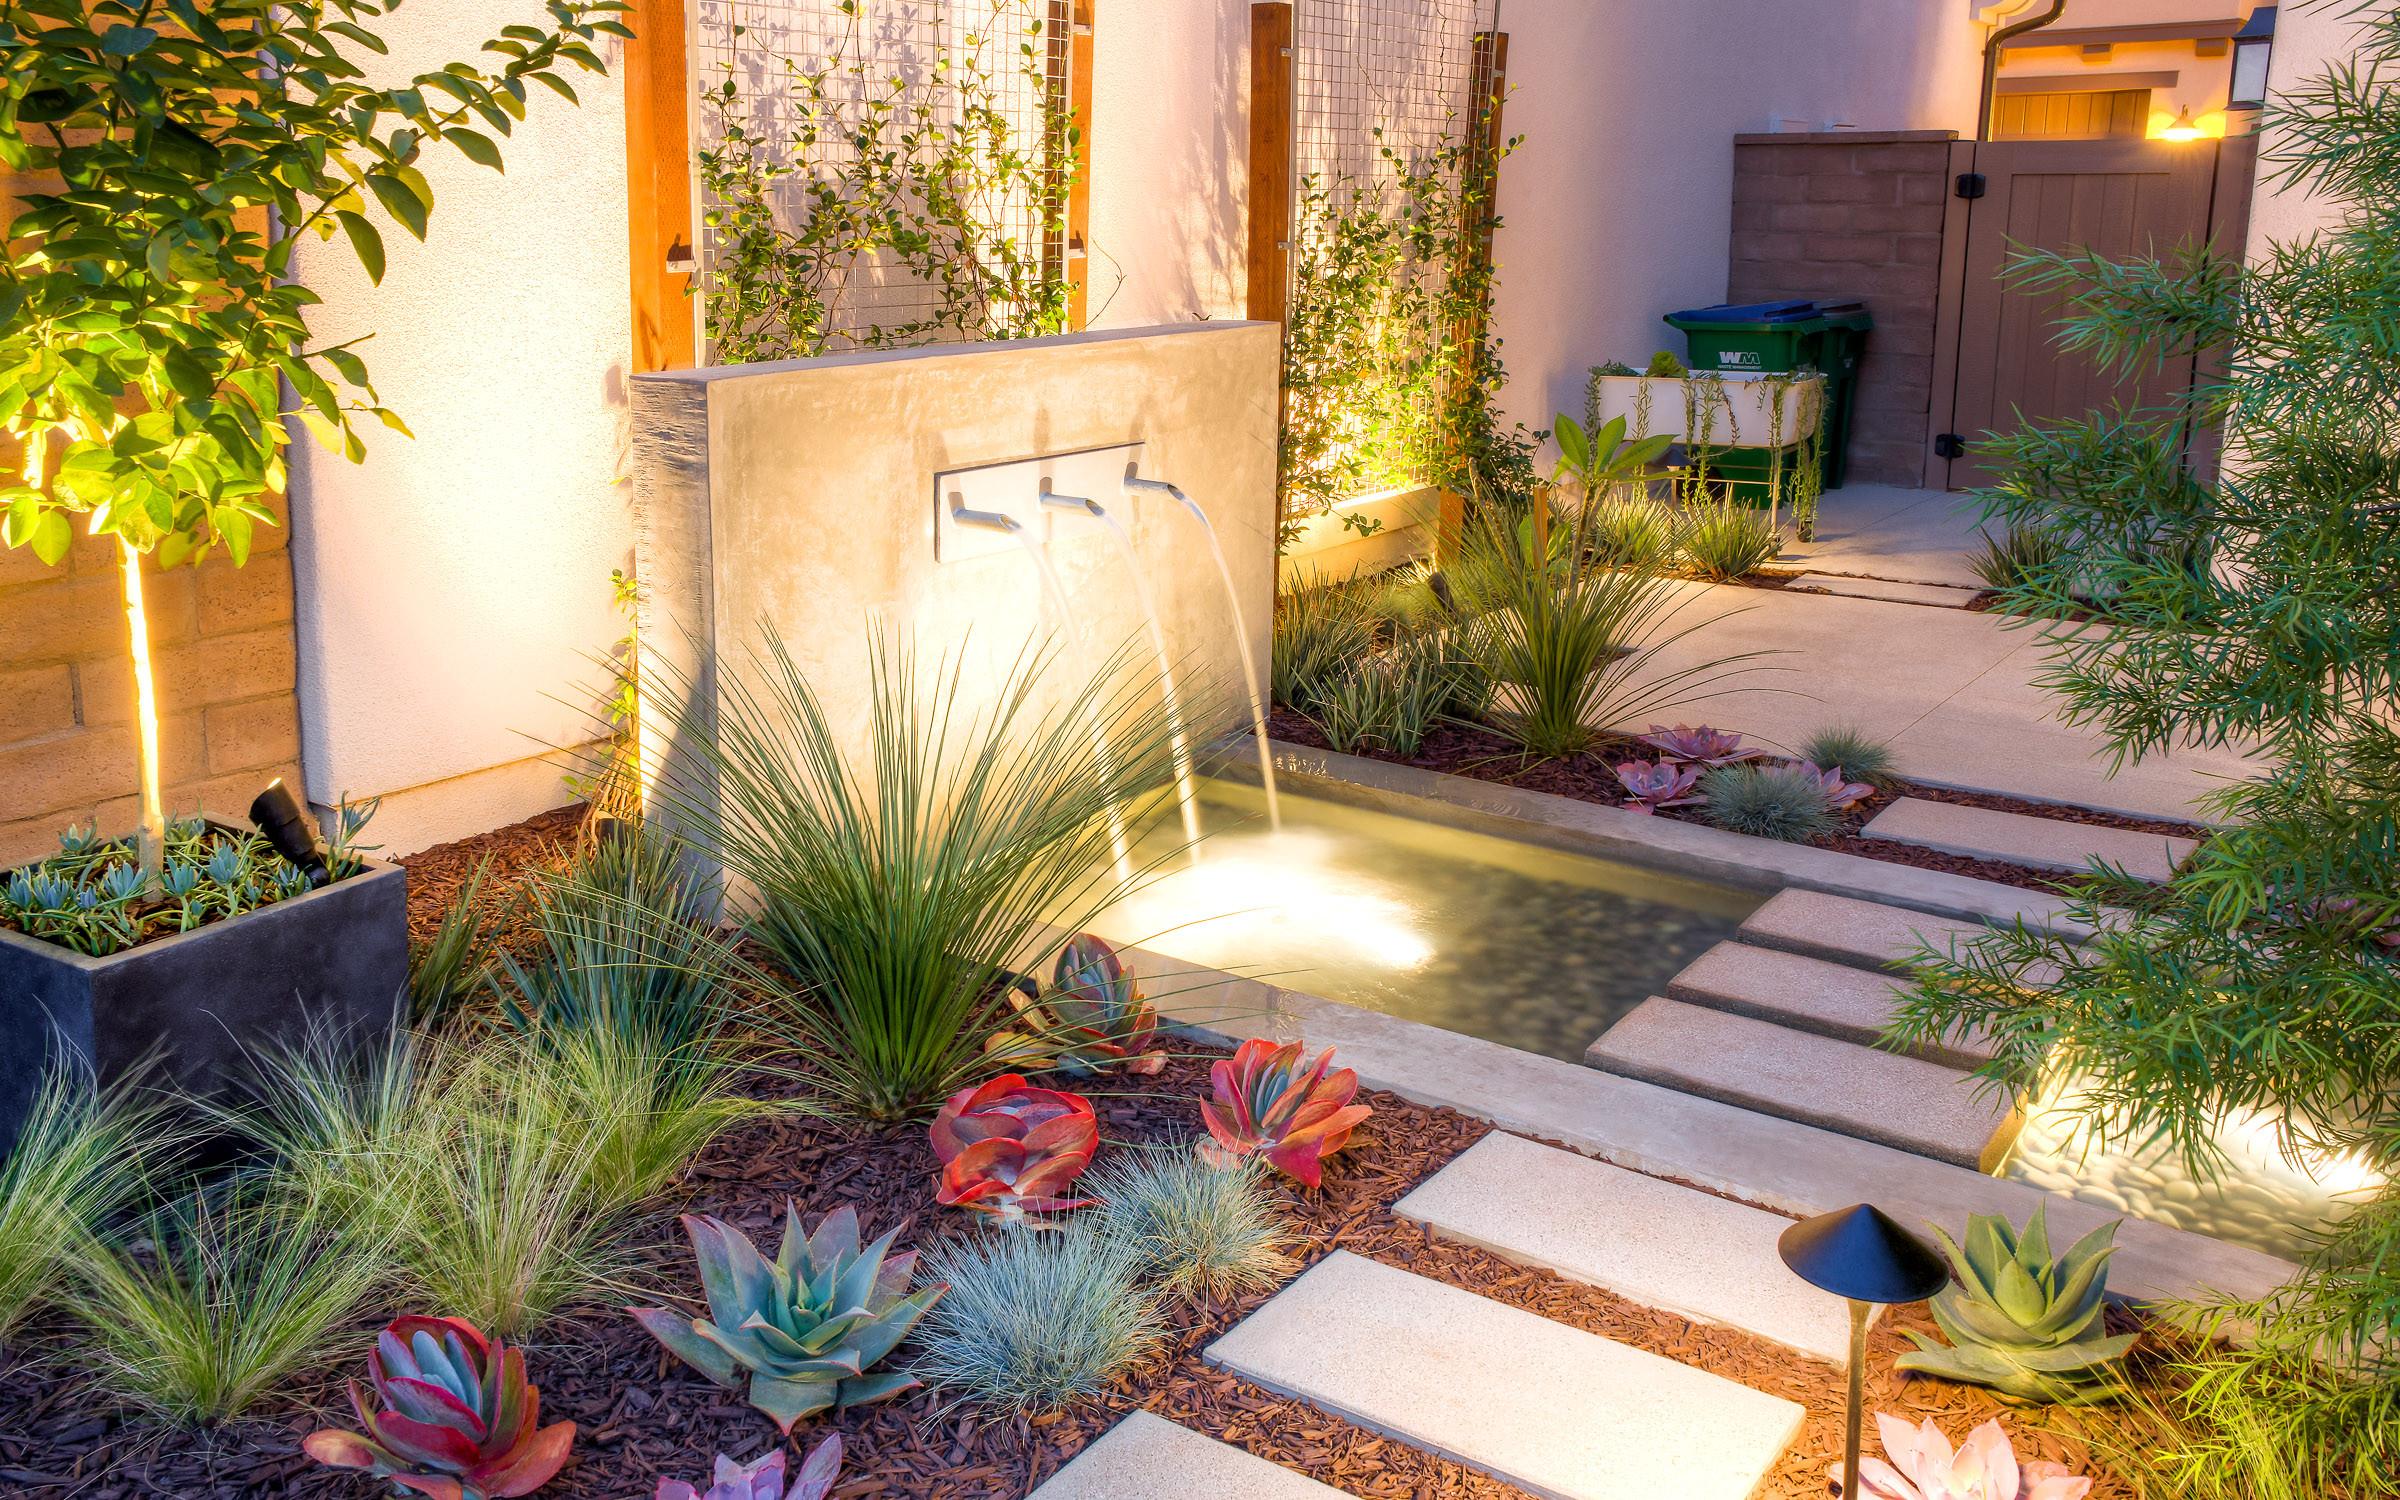 75 Beautiful Modern Water Fountain Landscape Pictures & Ideas - June, 2021  | Houzz